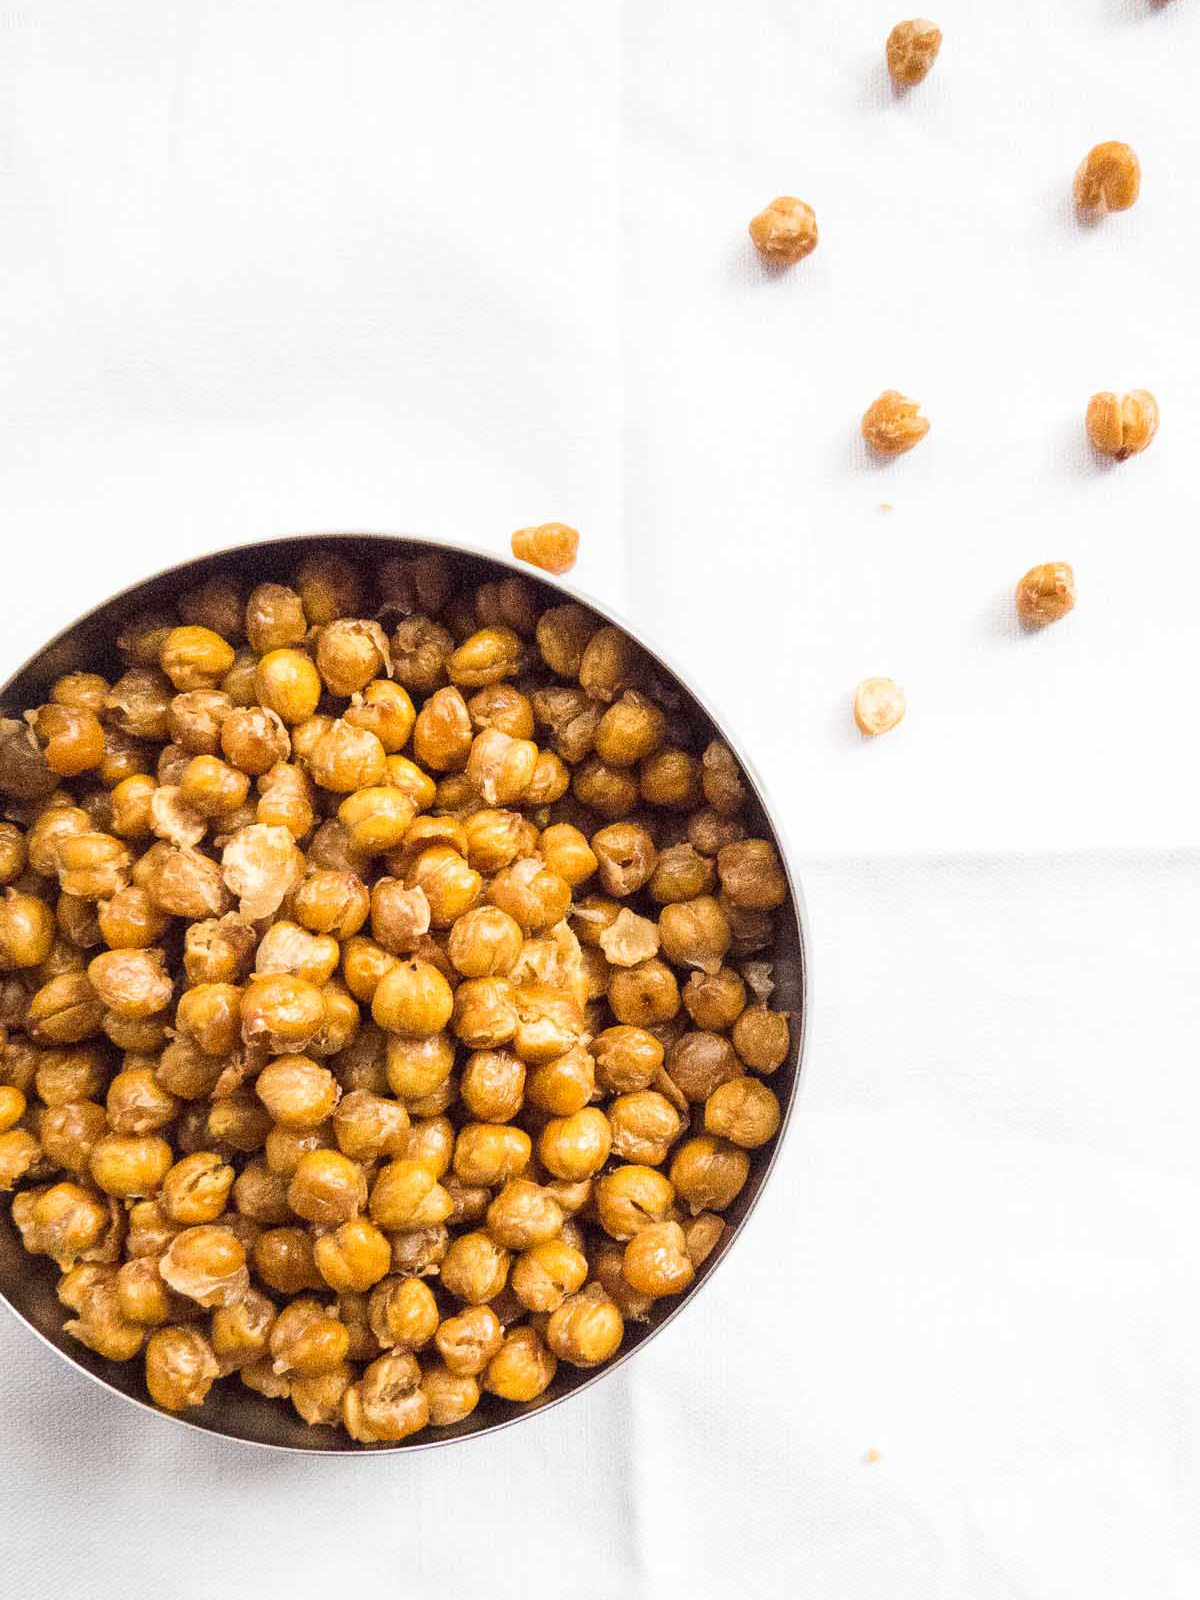 Crunchy Salted Roasted Chickpeas